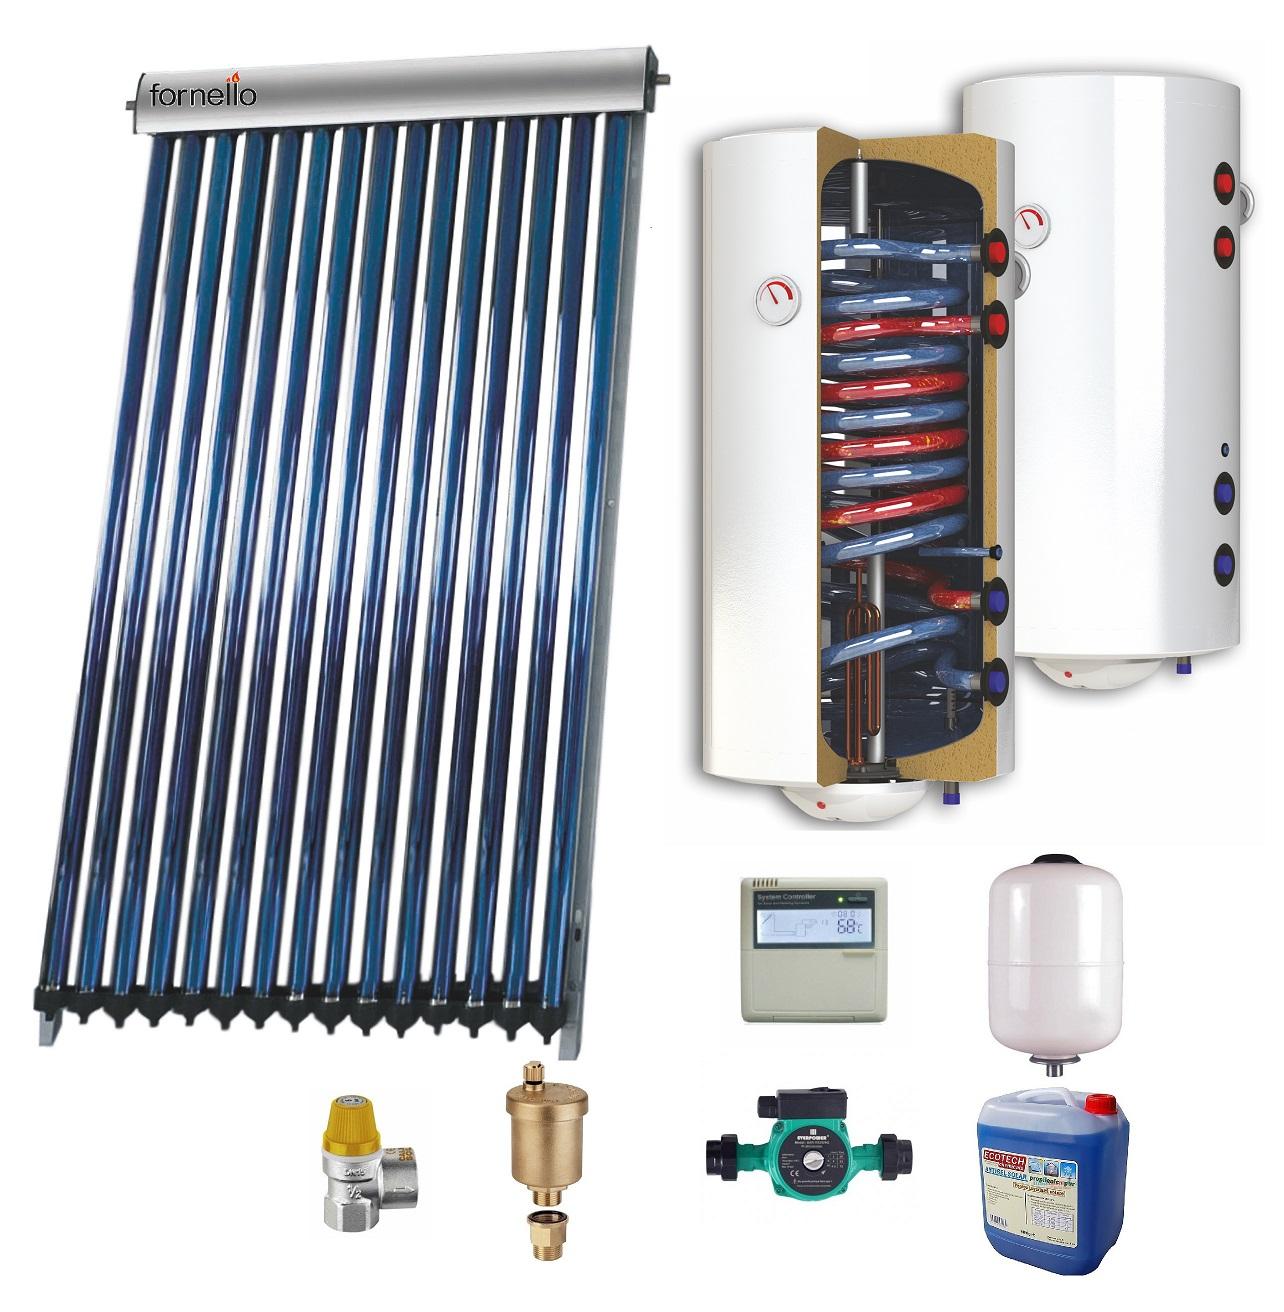 Sistem solar presurizat , panou Sunsystem VTC 15, boiler cu 2 serpentine si rezistenta electrica Sunsystem 120 litri, pompa 25-60, controller, vas expansiune, antigel, supapa 1/2, aerisitor 1/2 fornello imagine